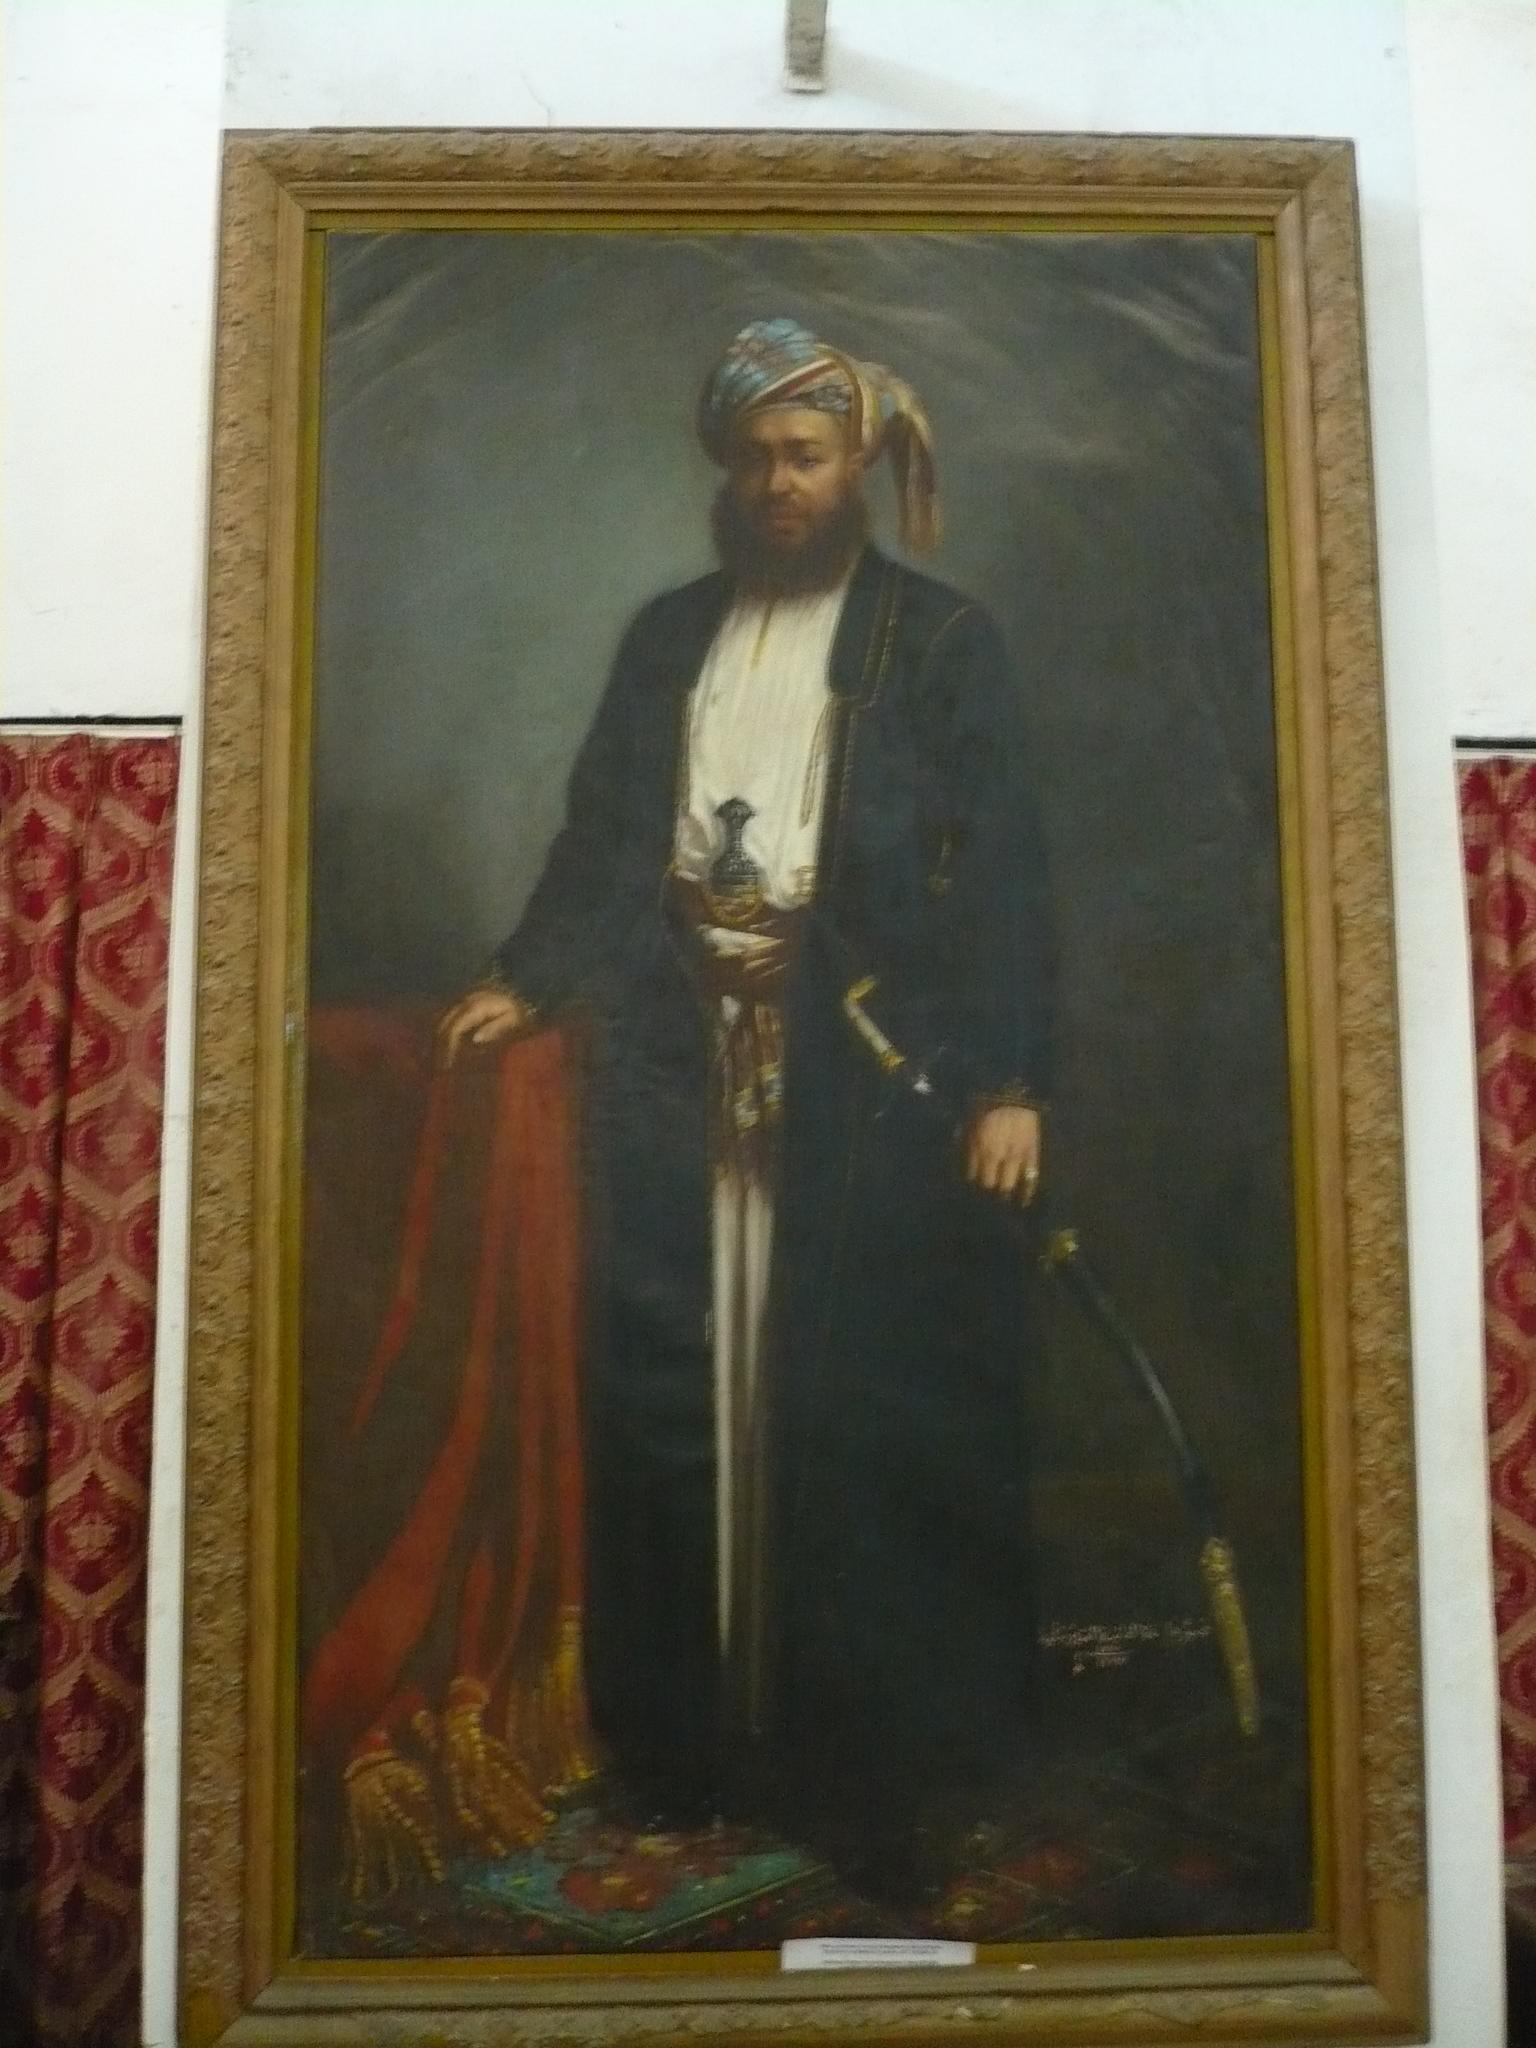 Sultant Bargash of Zanzibar